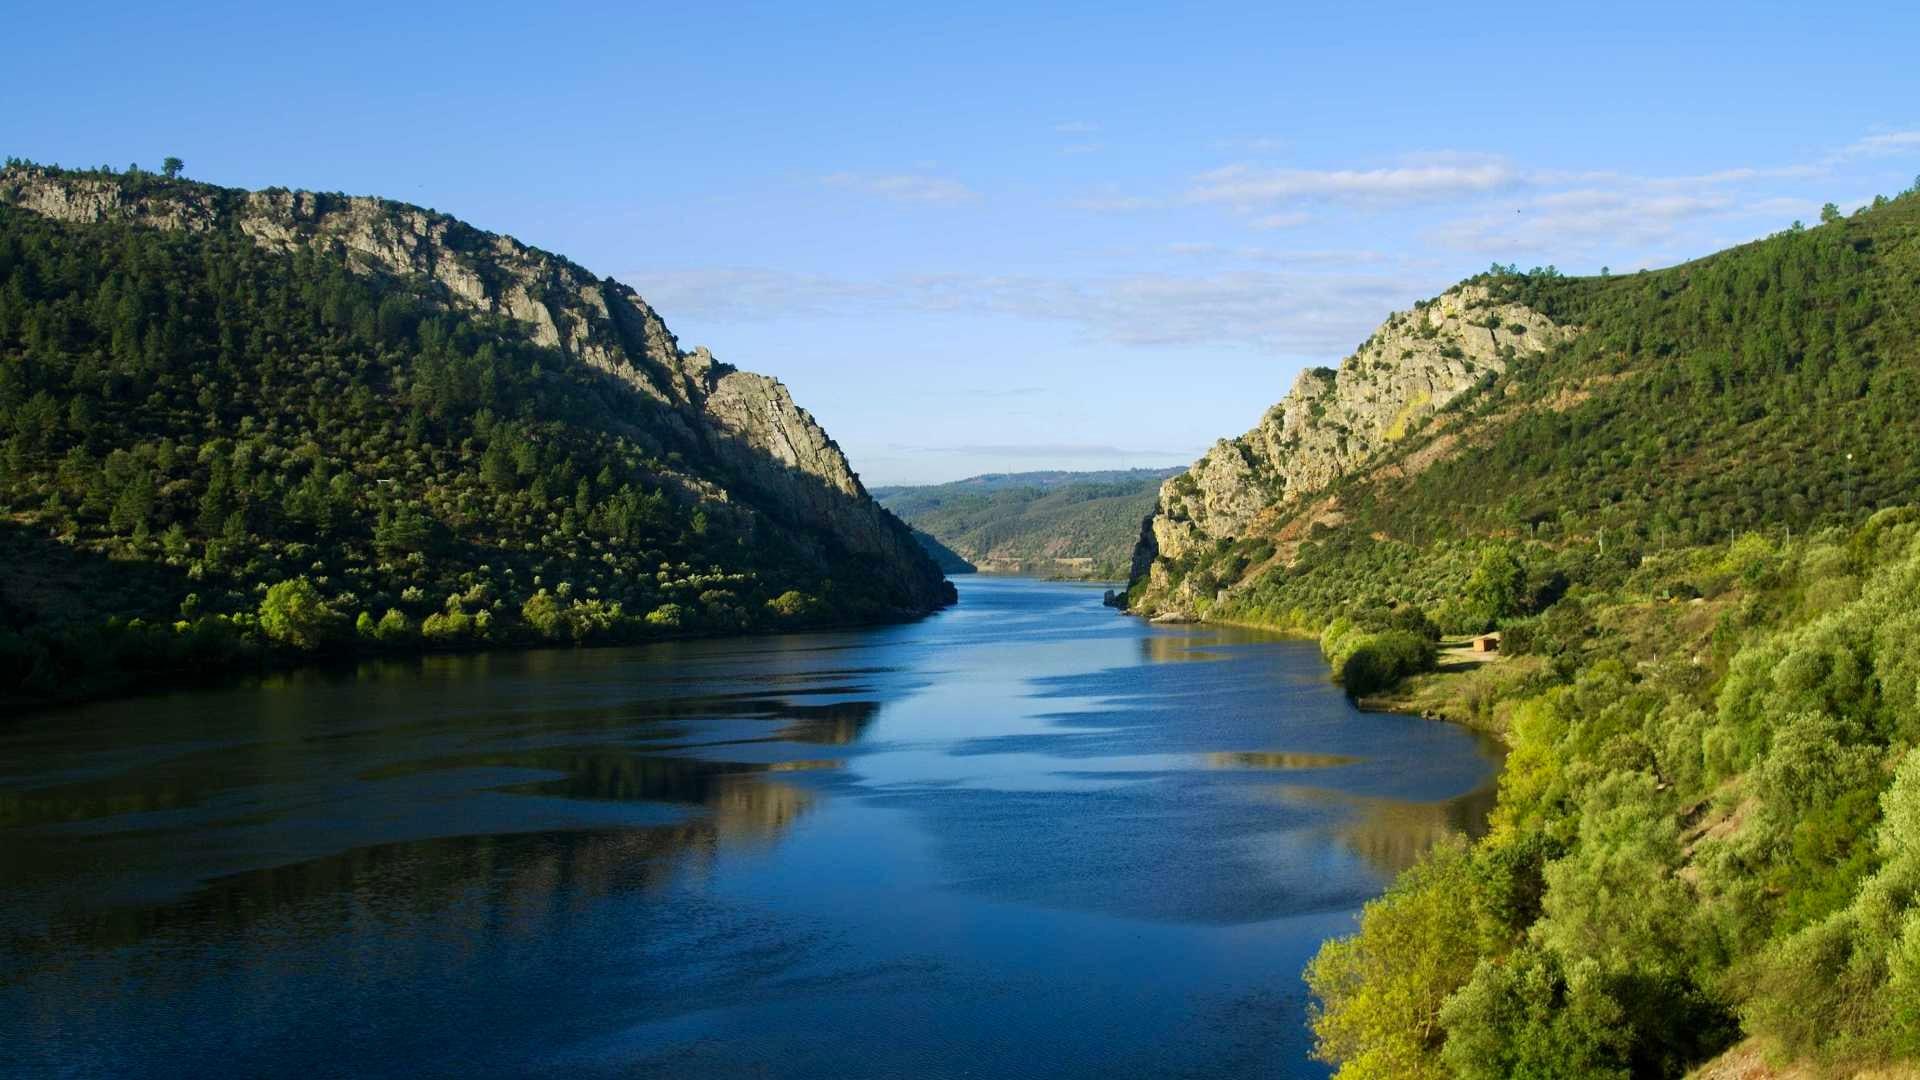 Amazing river beaches along the Tejo